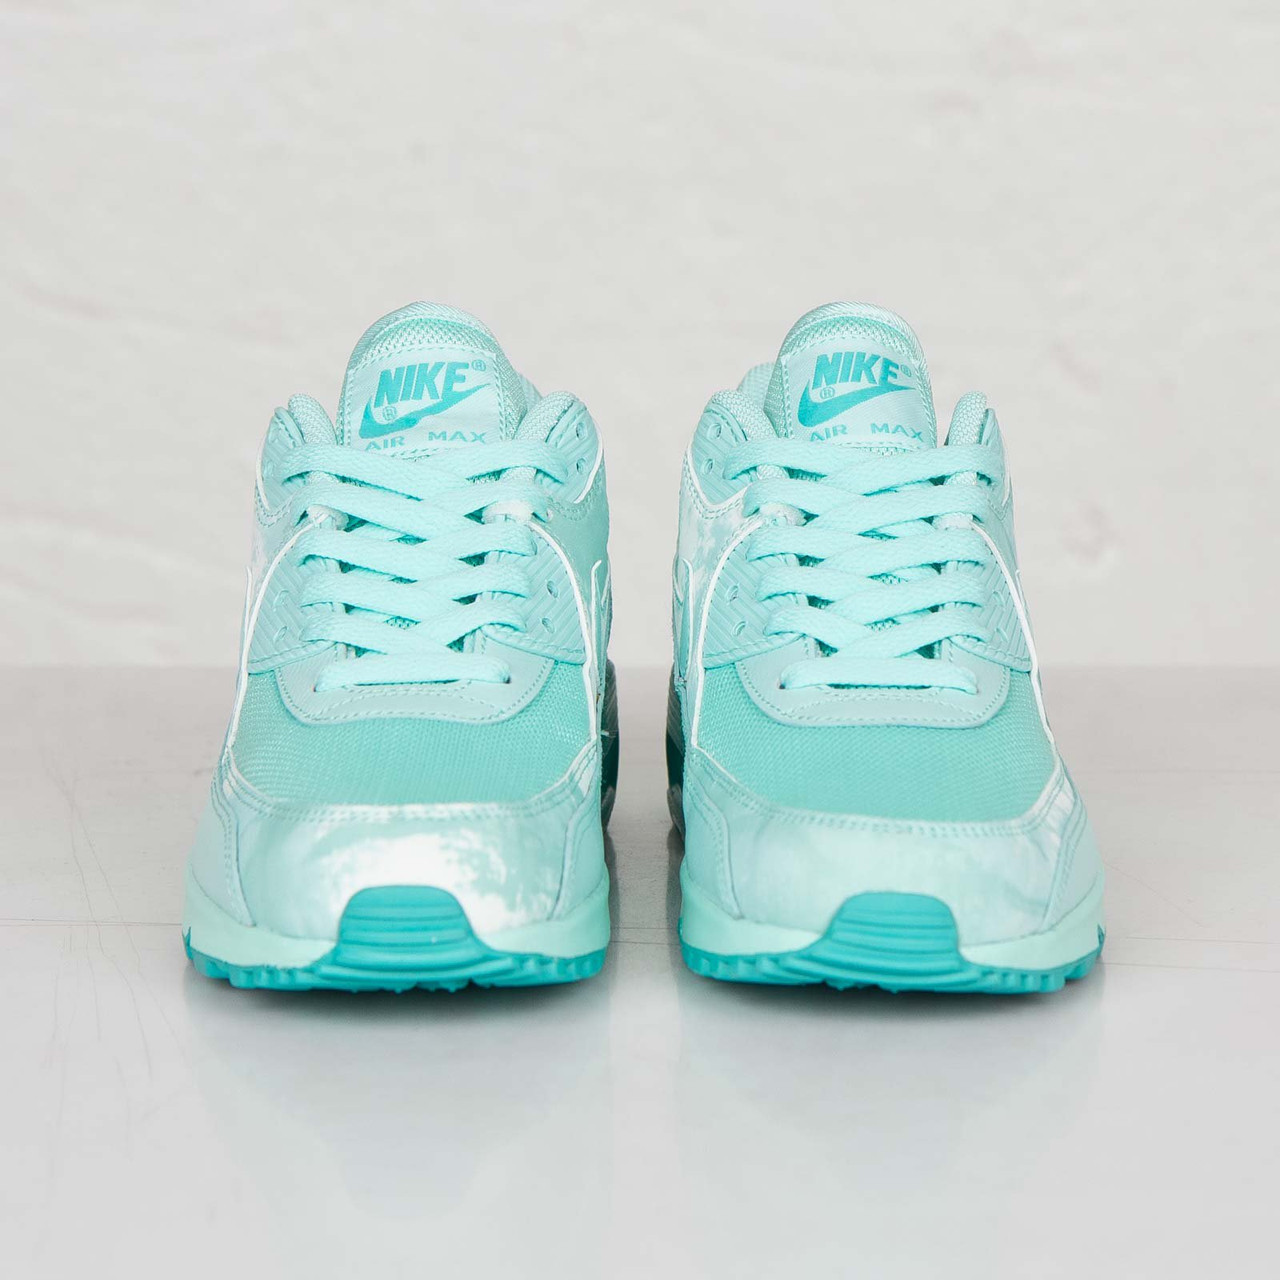 pretty nice 35212 246b7 ... Nike Air Max 90 Premium Print Artisan Teal  кроссовки женские  бирюзовые, ...